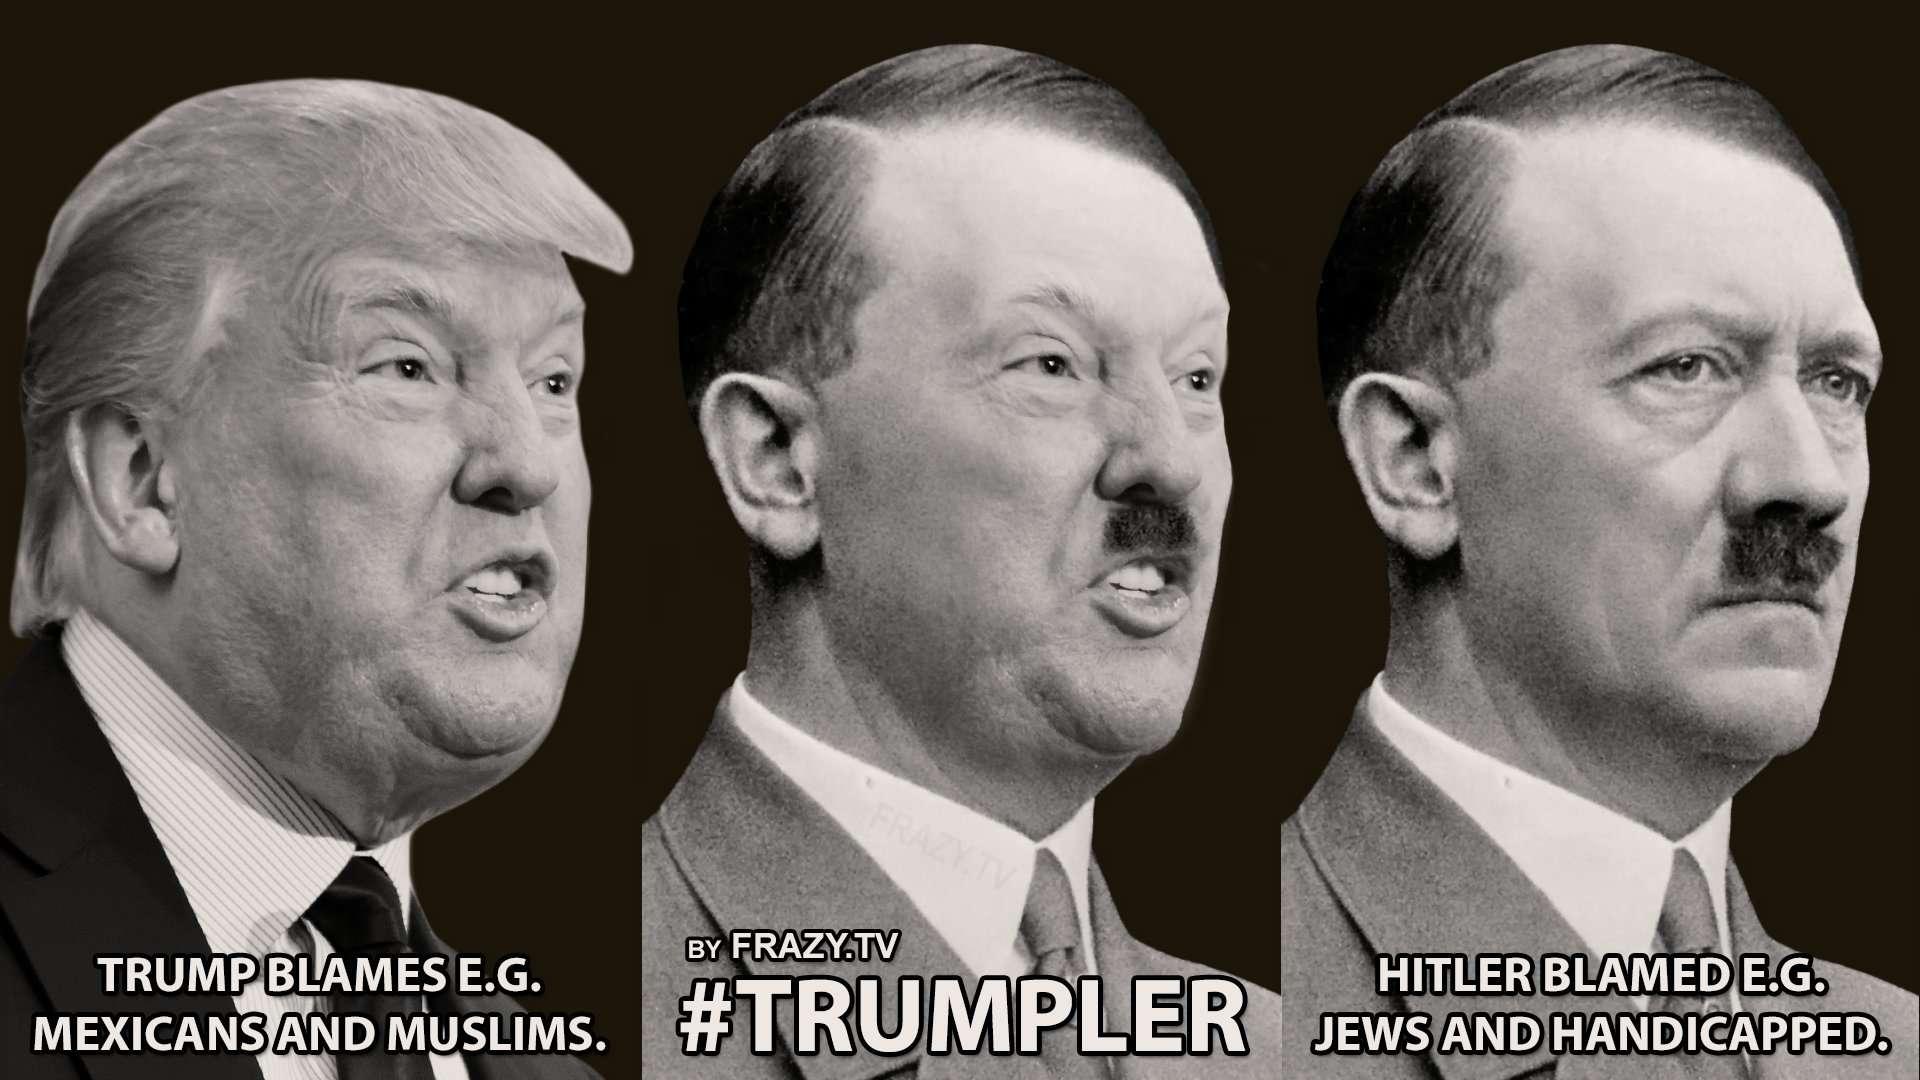 trumpler-by-frazy-tv-trump-hitler-trumpler